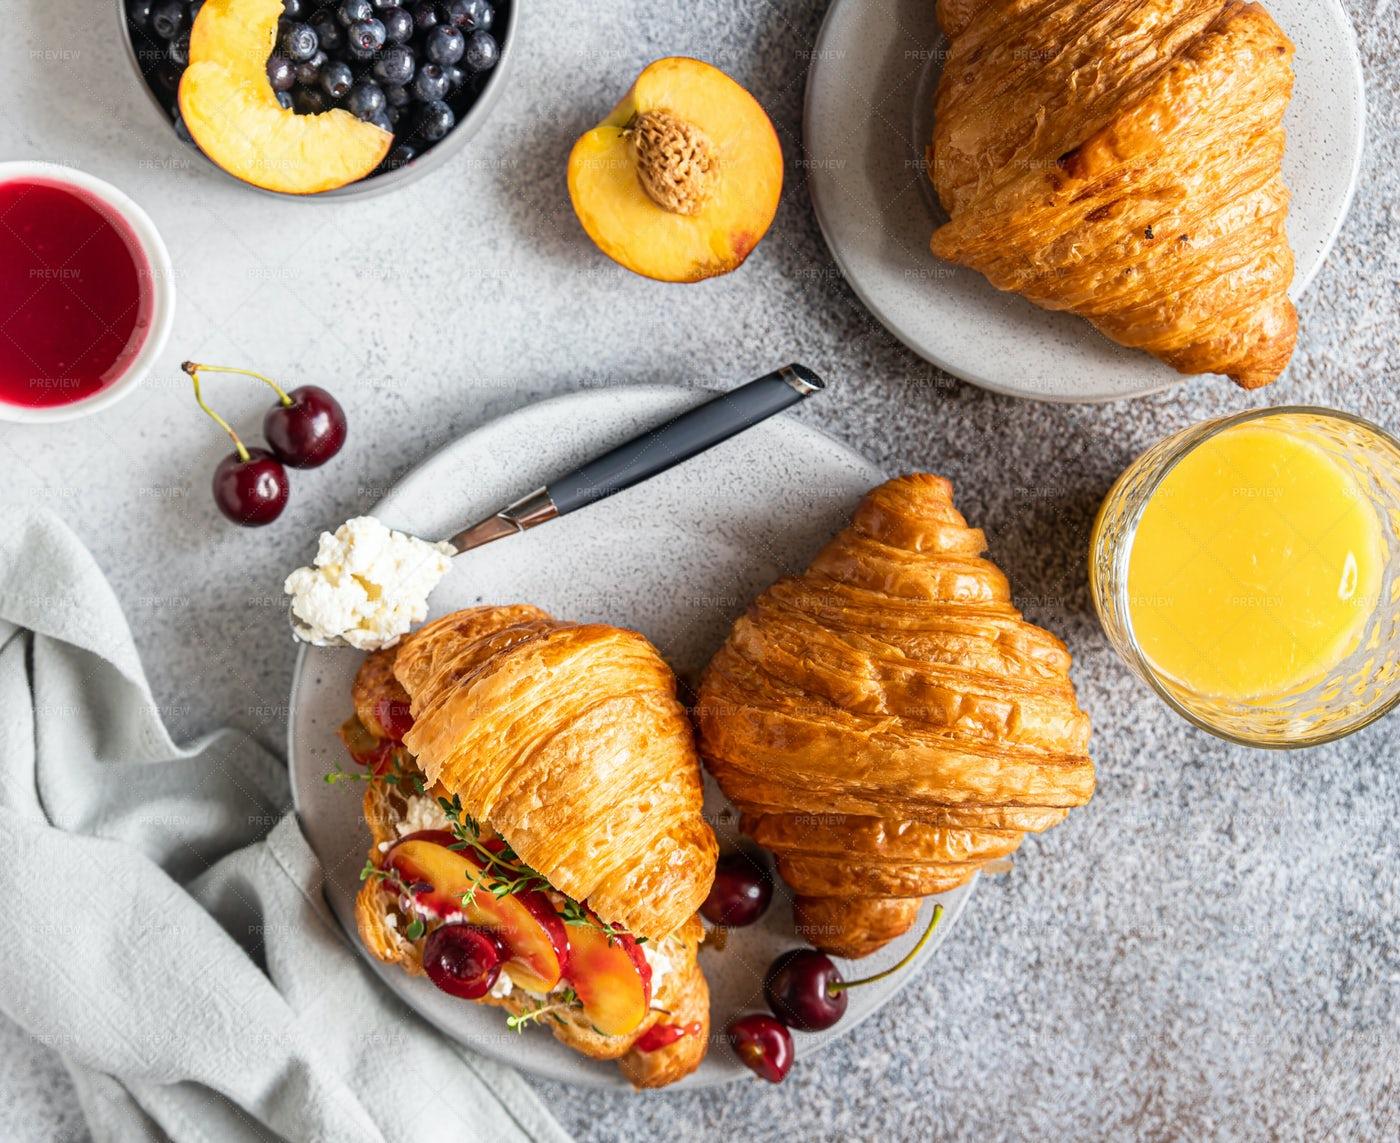 Croissant Sandwiches With Nectarine: Stock Photos